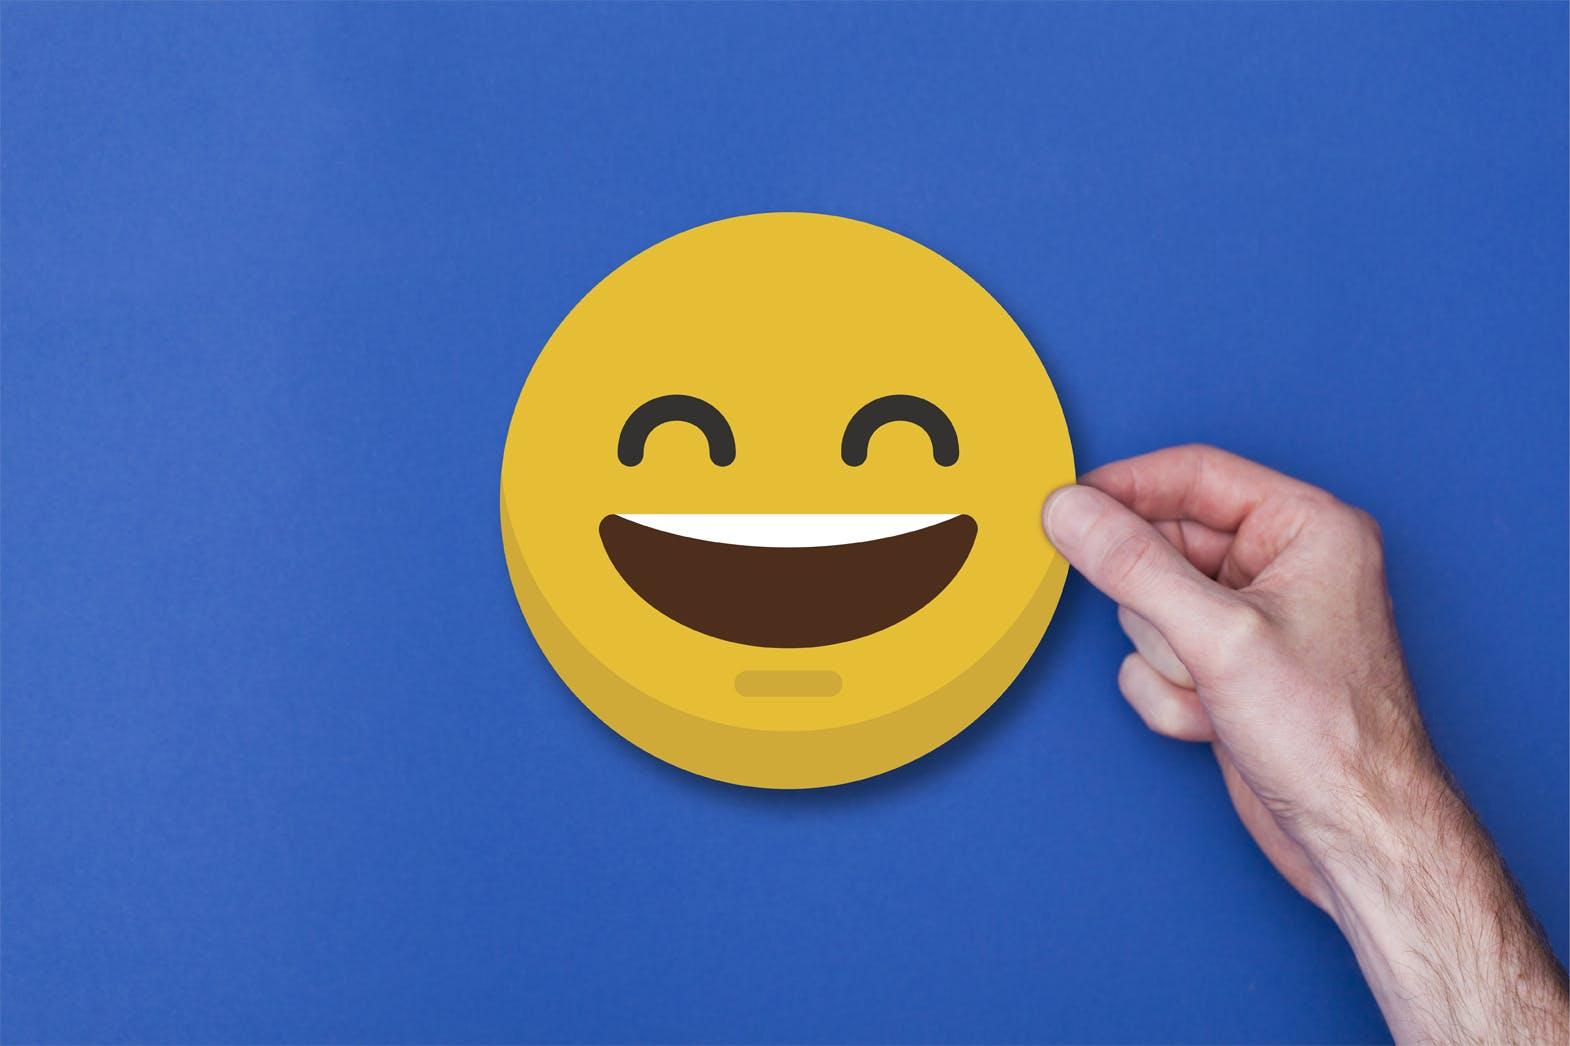 Male hand holding a emoji emoticon smiley head icon